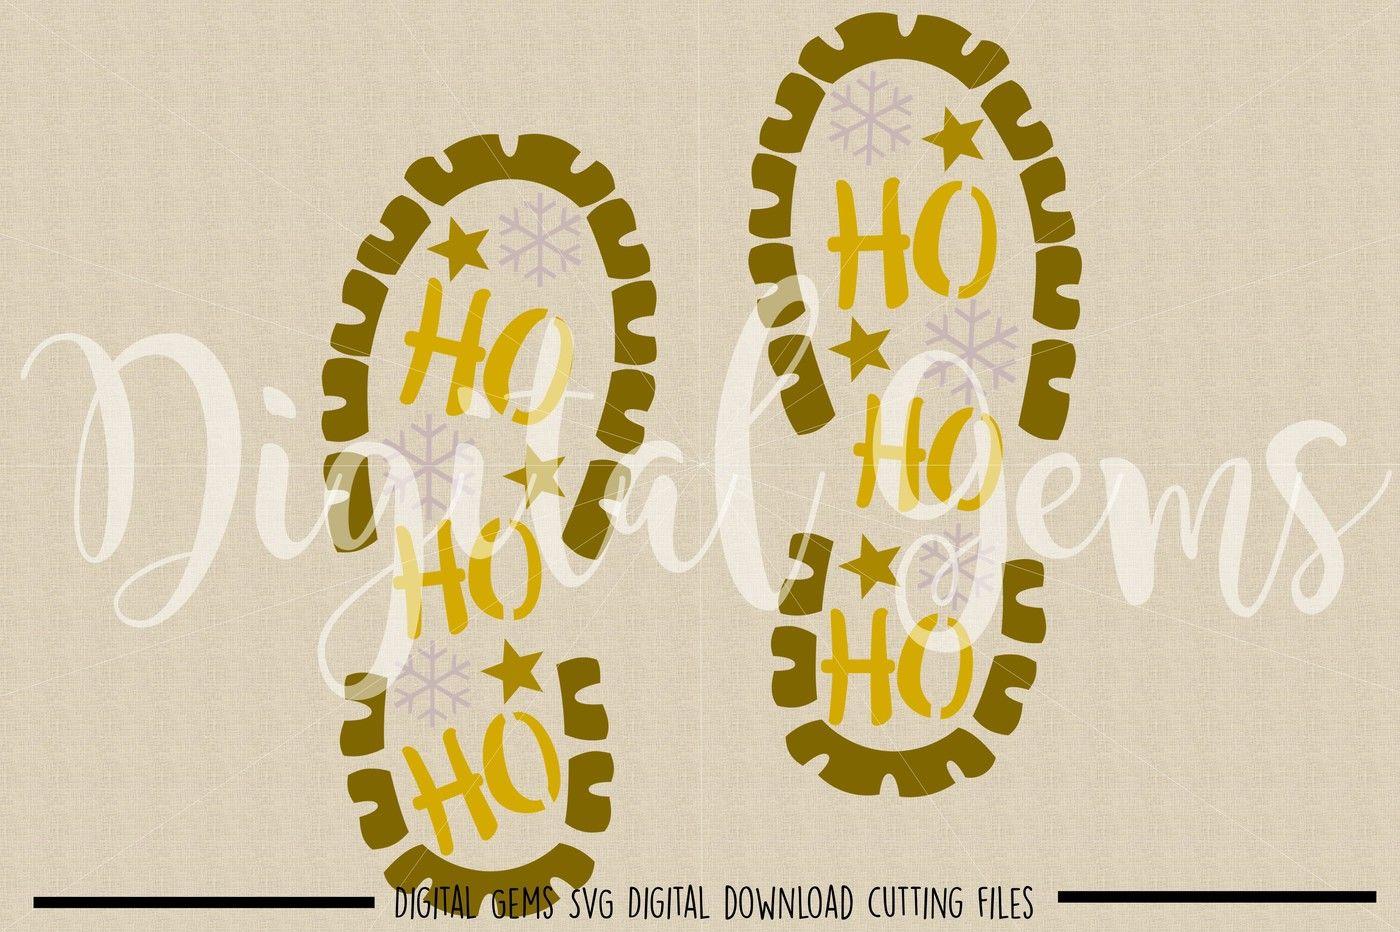 Santa Foot Print Svg Dxf Png Eps Files By Digital Gems